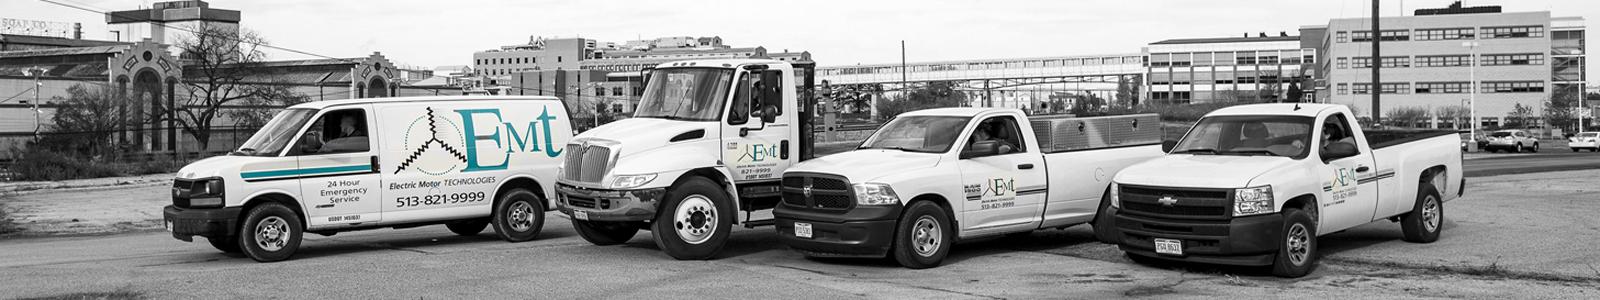 Blog Get Your Motors Running Electric Motor Technologies